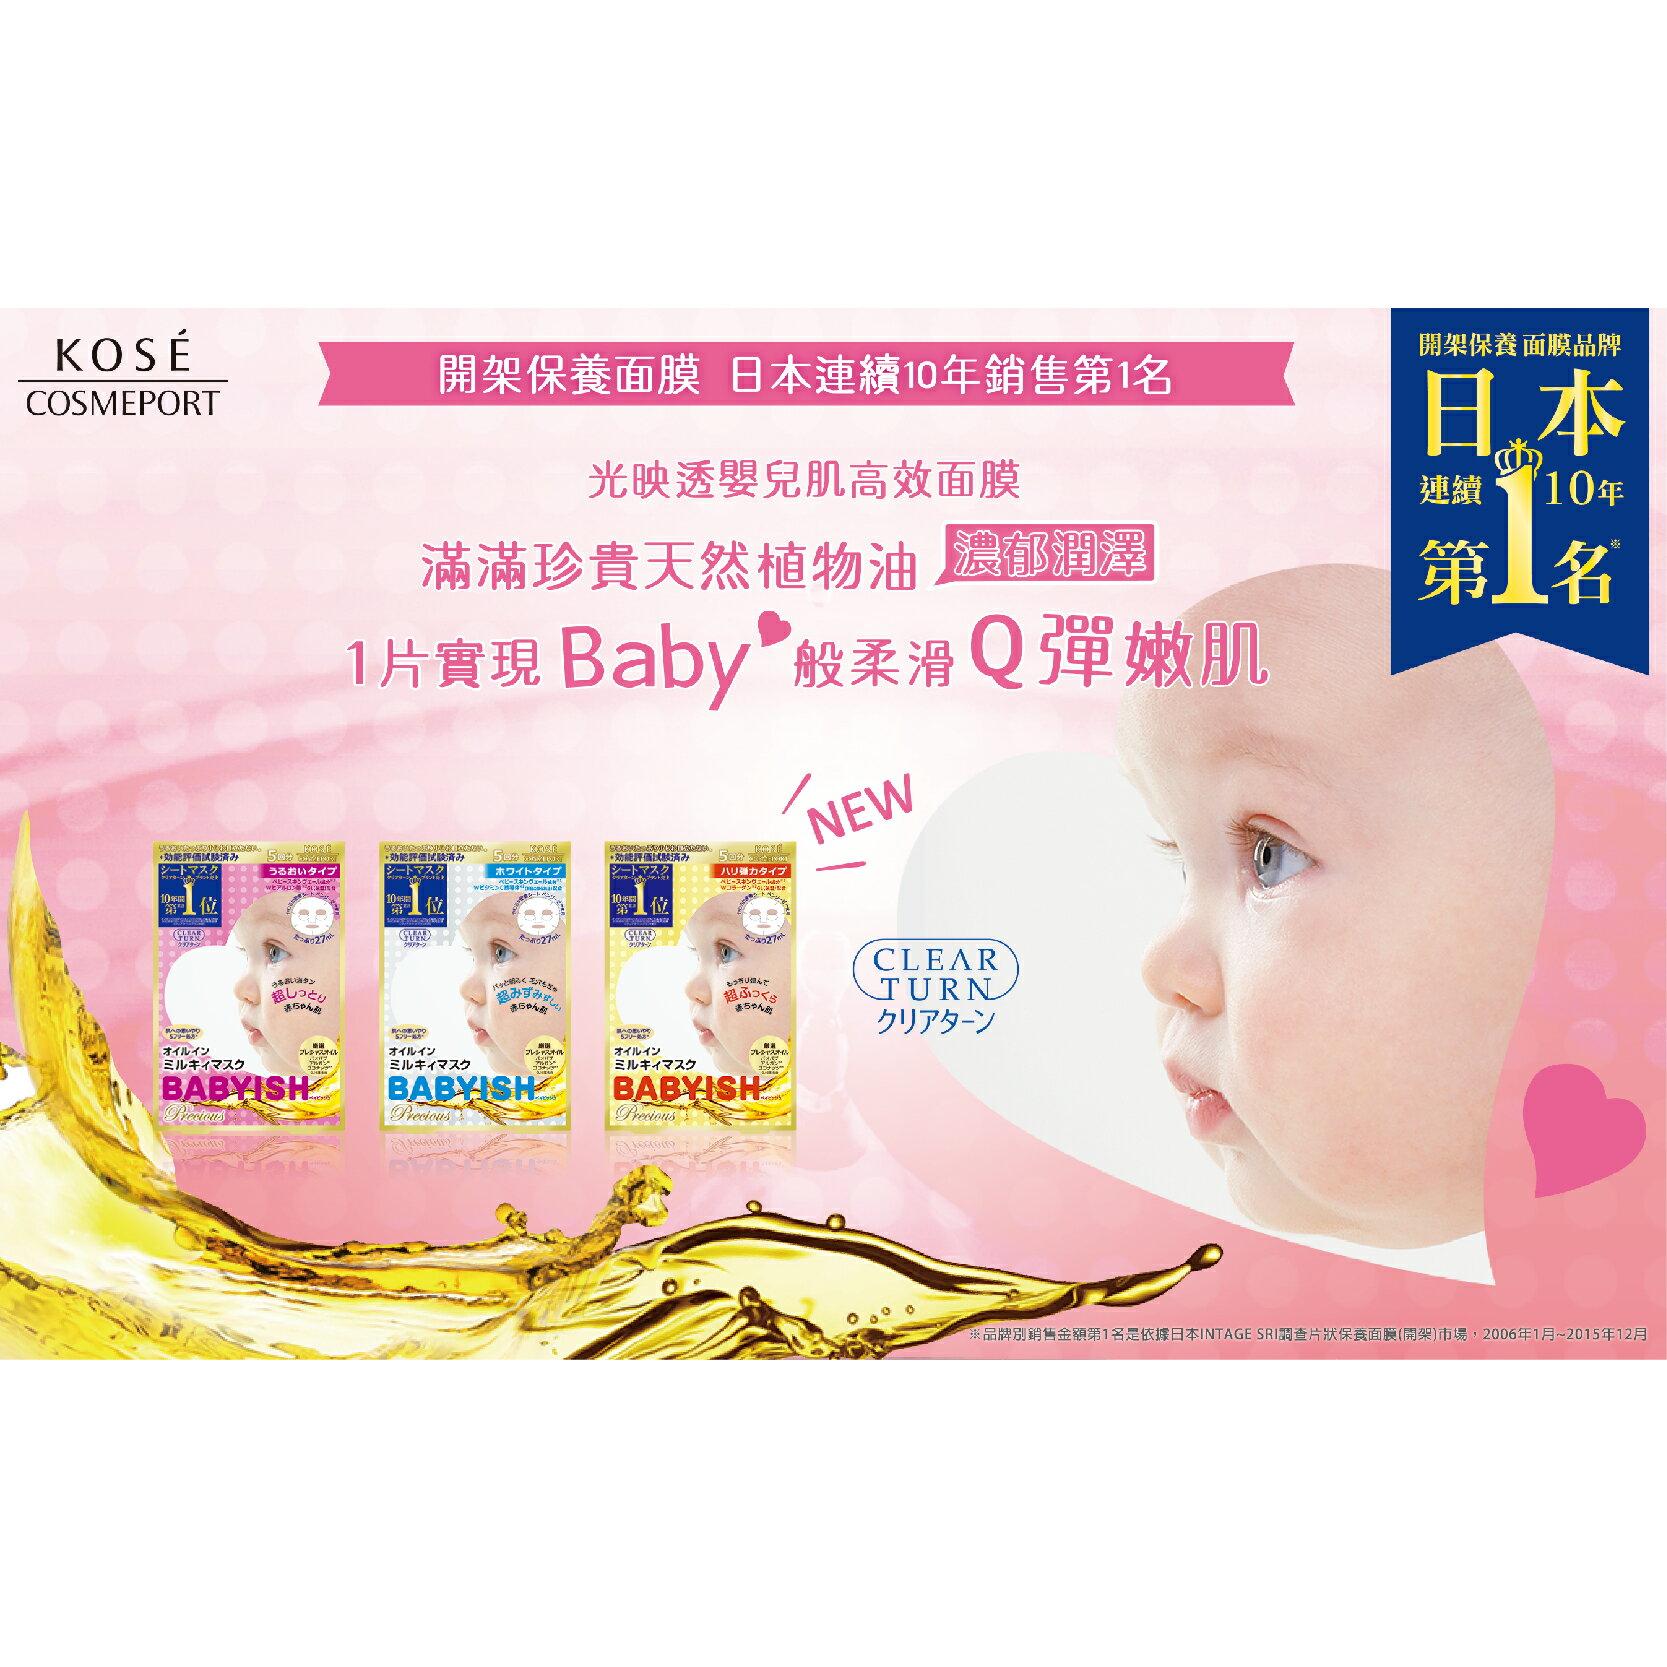 KOSE 高絲 光映透 嬰兒肌面膜-5枚入(高效保濕/緊緻彈力/亮白保濕)